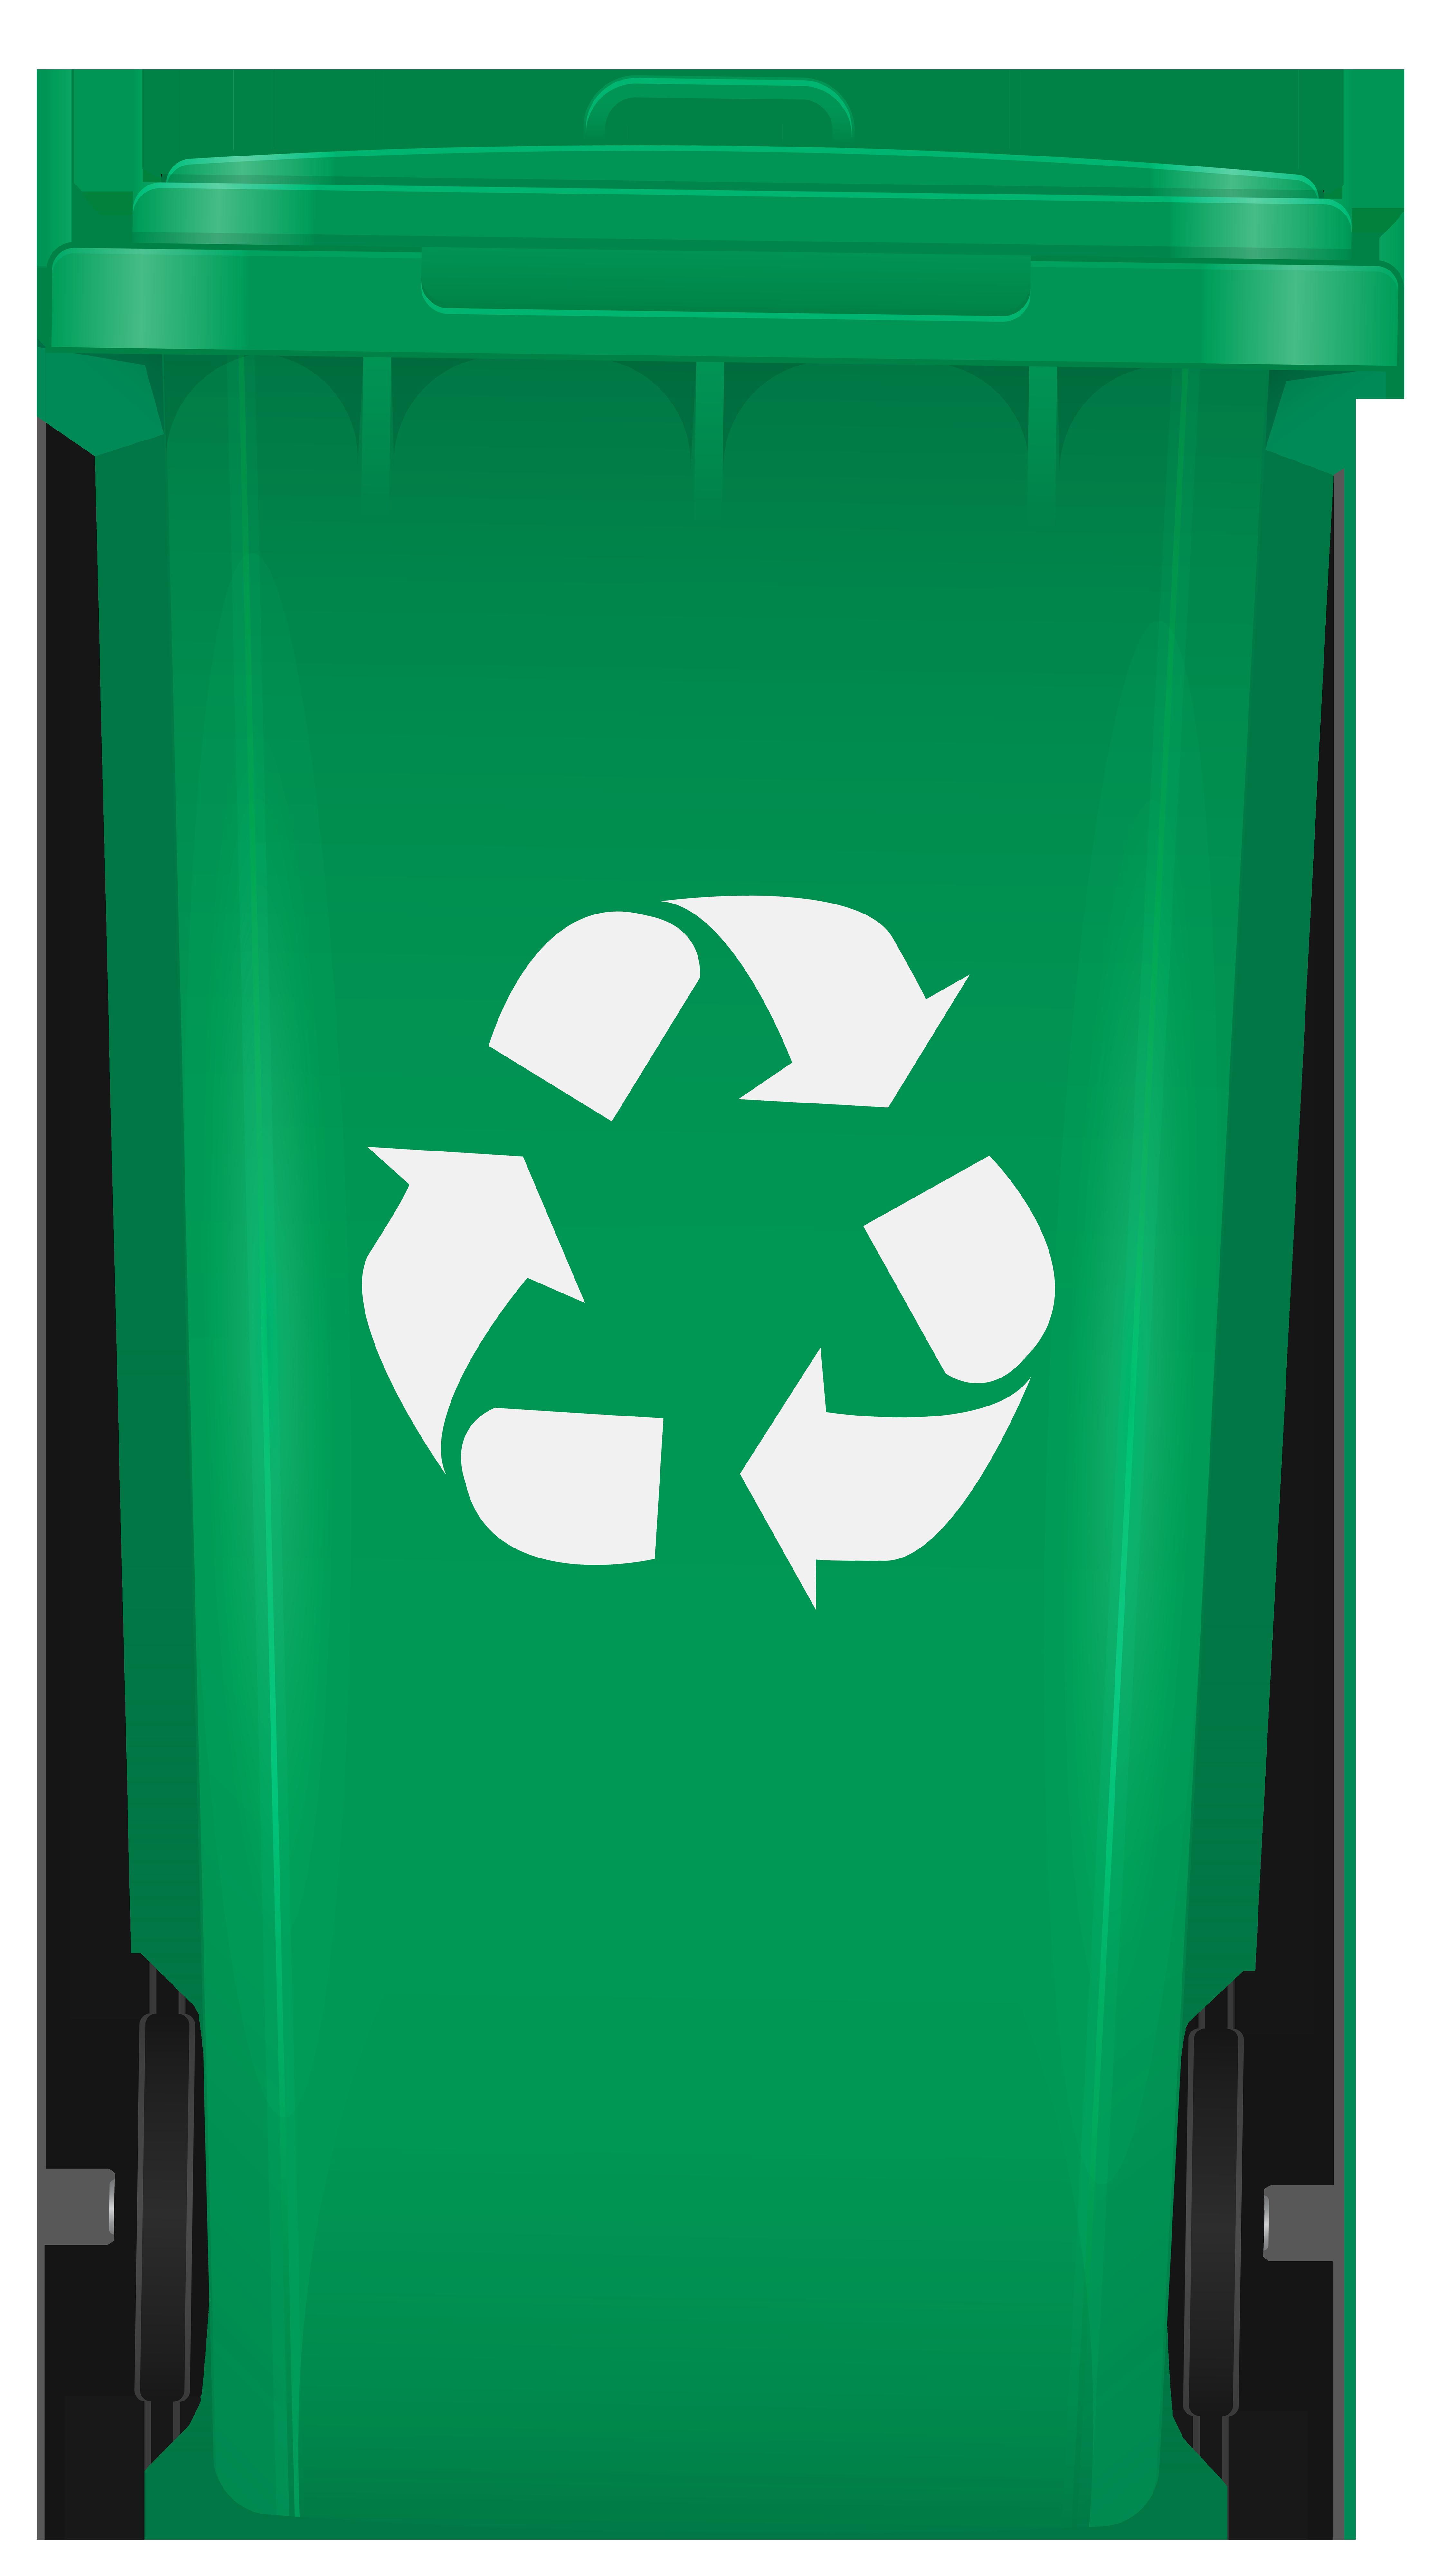 Recycling Bin PNG Clip Art.